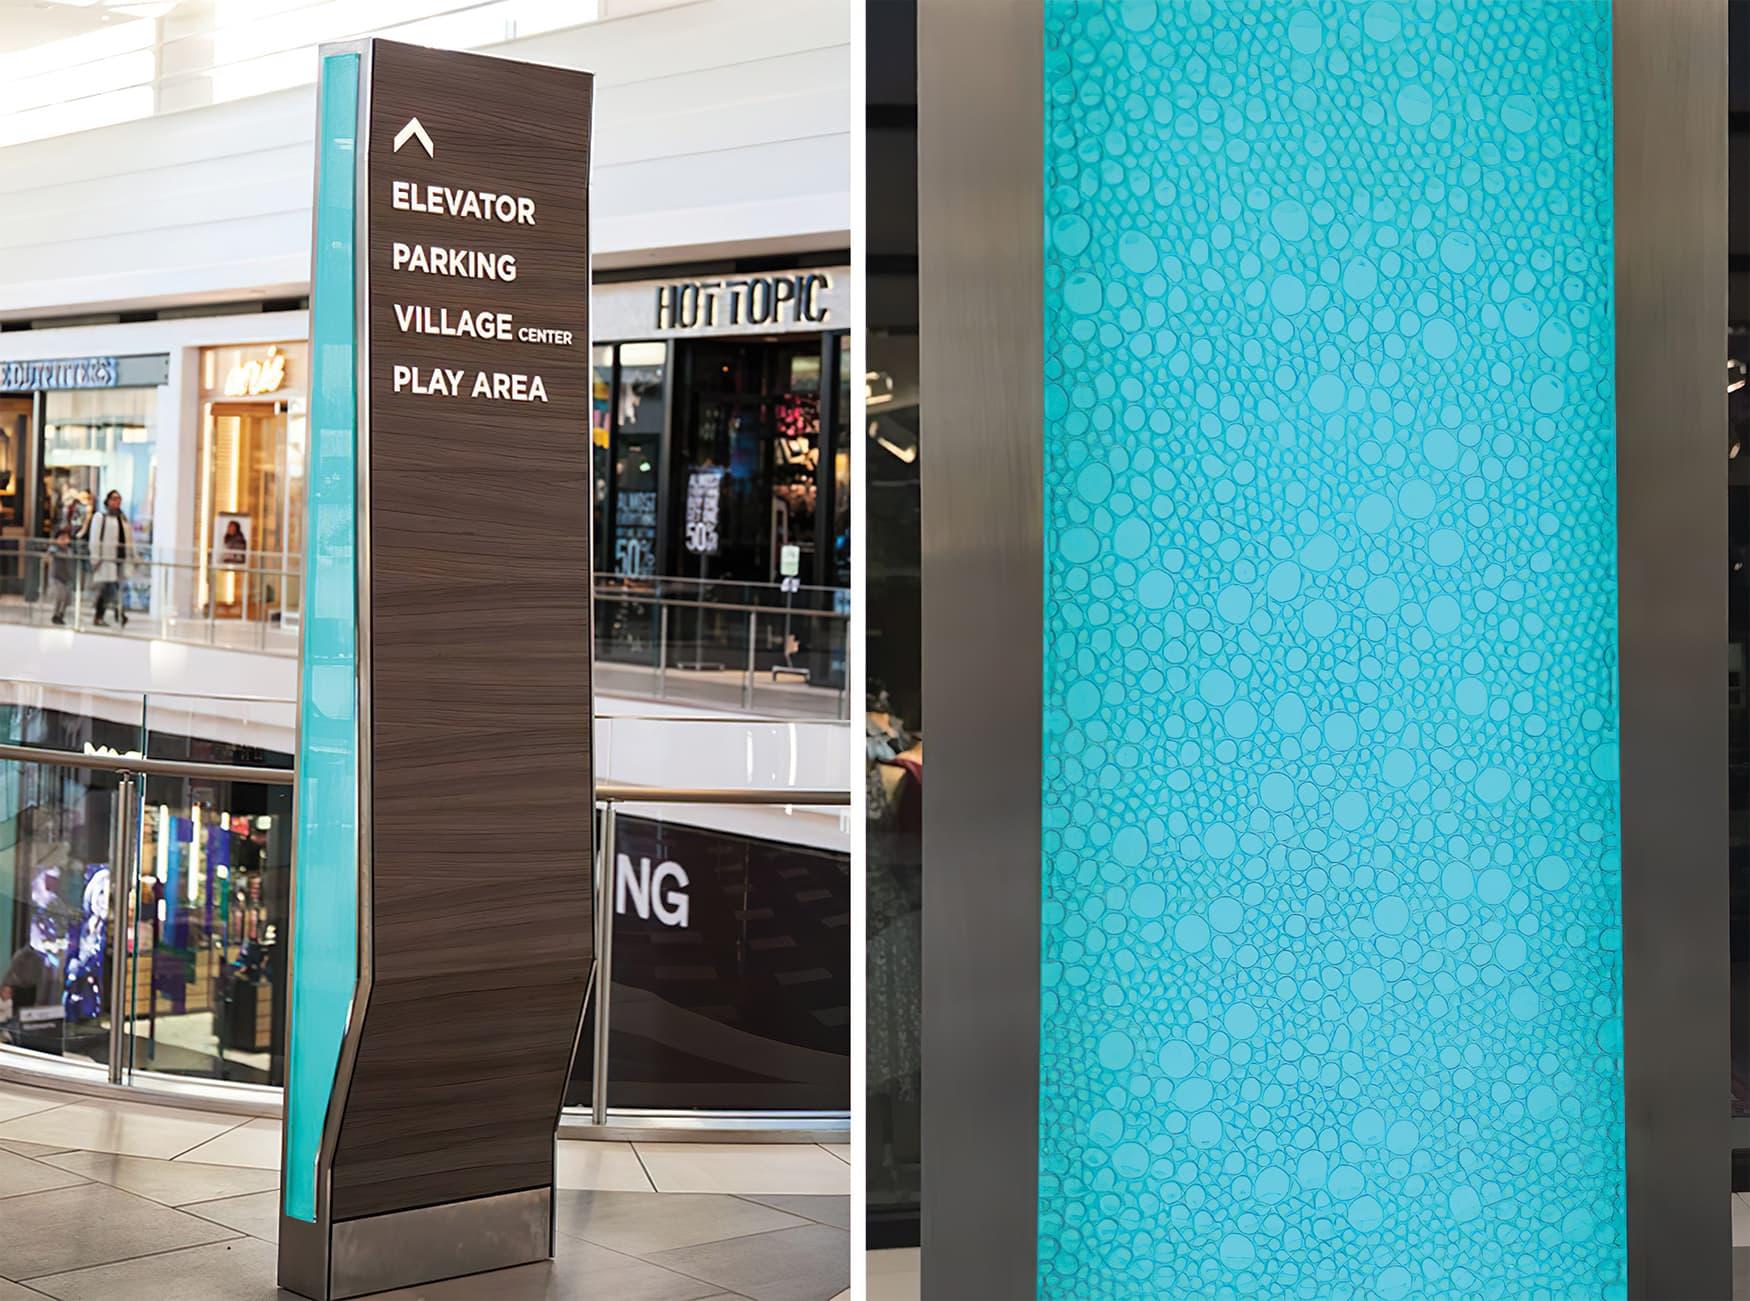 Del Amo Fashion Center located in Torrance, California. Retail shopping center pedestrian wayfinding design.